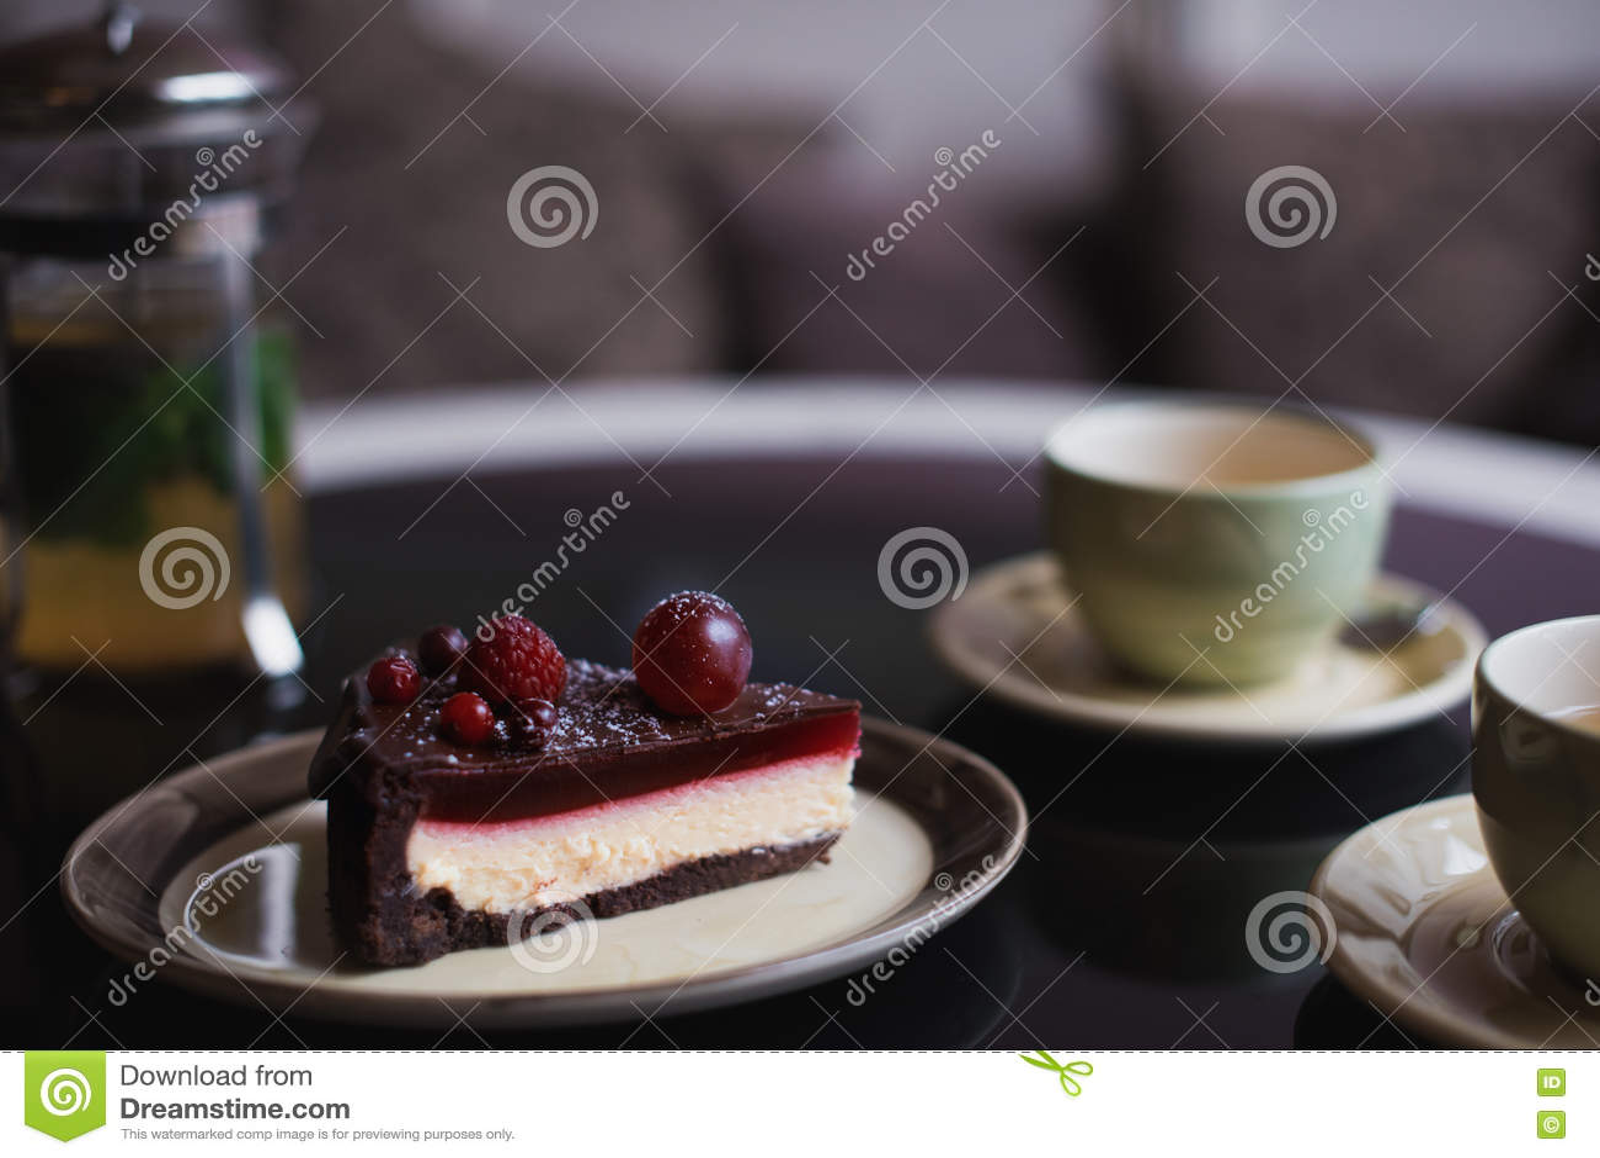 Chocolate Cake Recipe Using Drinking Chocolate